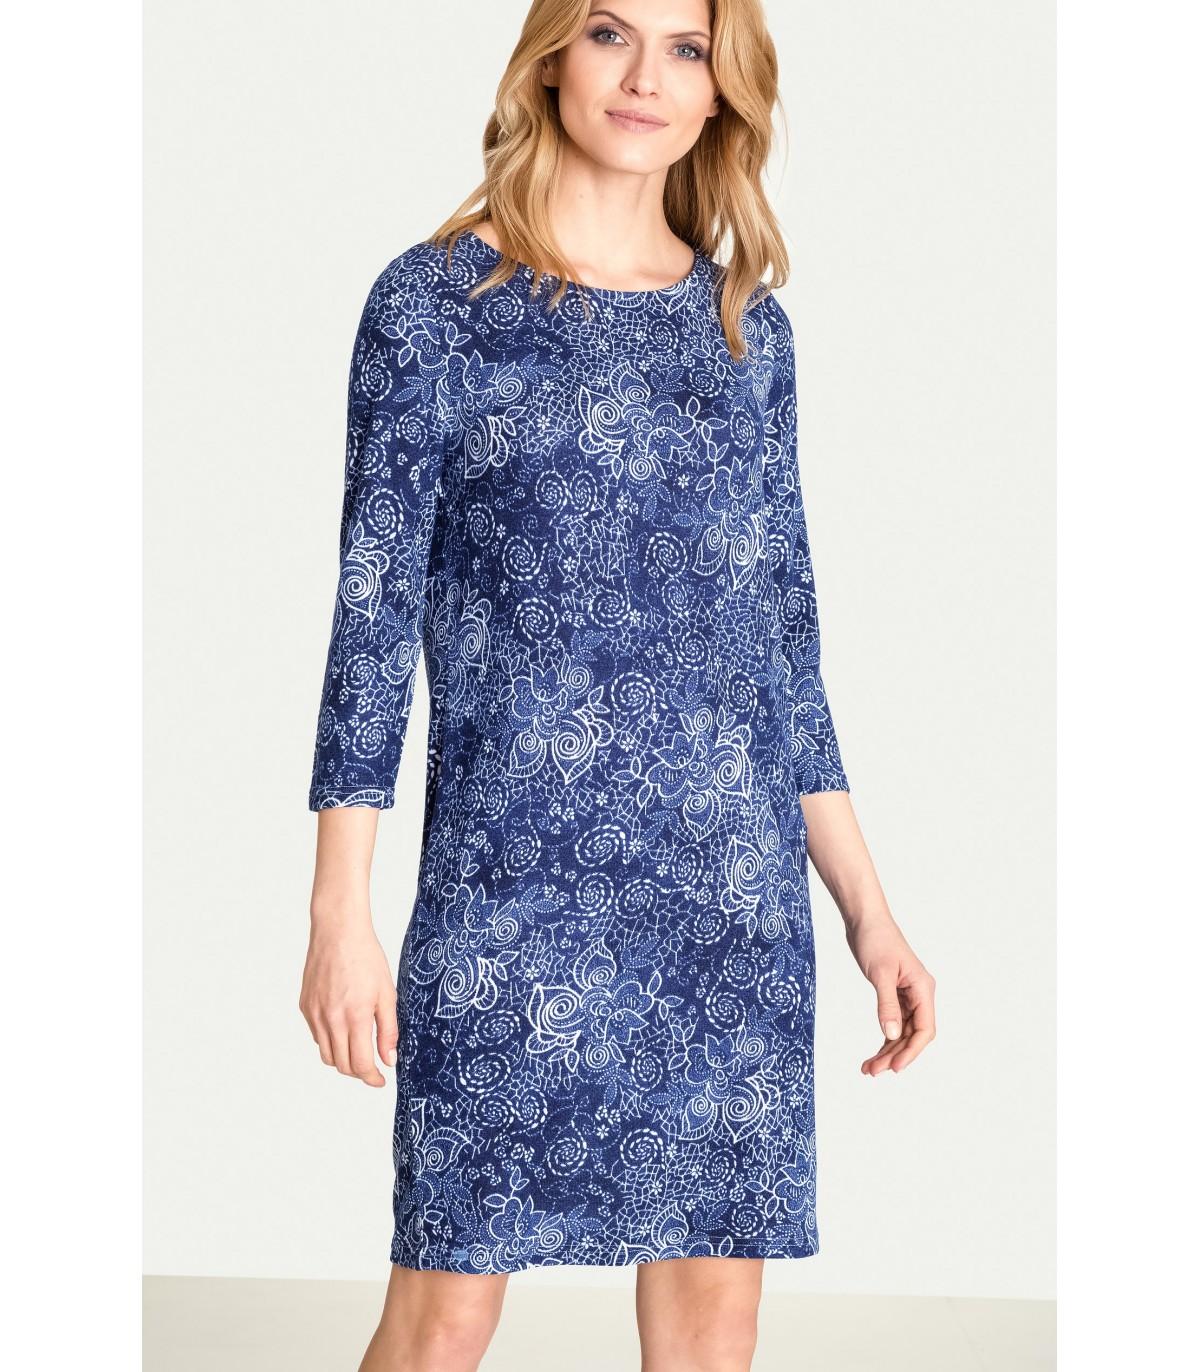 03cda00505d1 Jednoduché pletené šaty - 6025 - Grenpointfashion